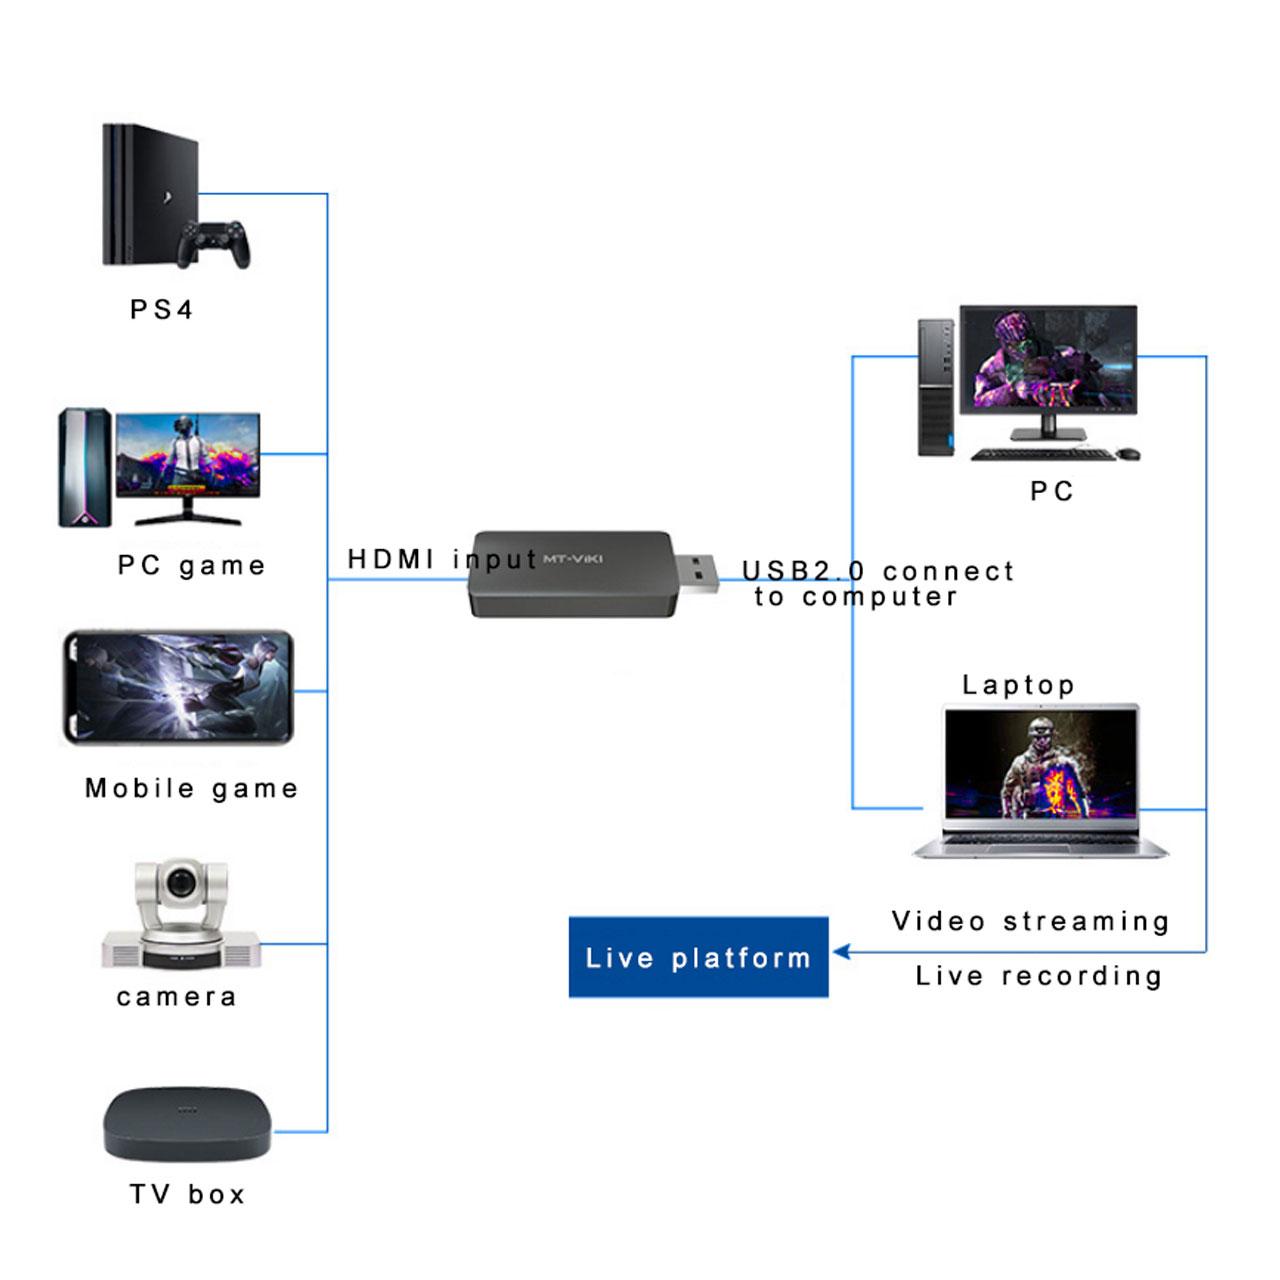 کپچر HDMI مدل MT-UHV20T